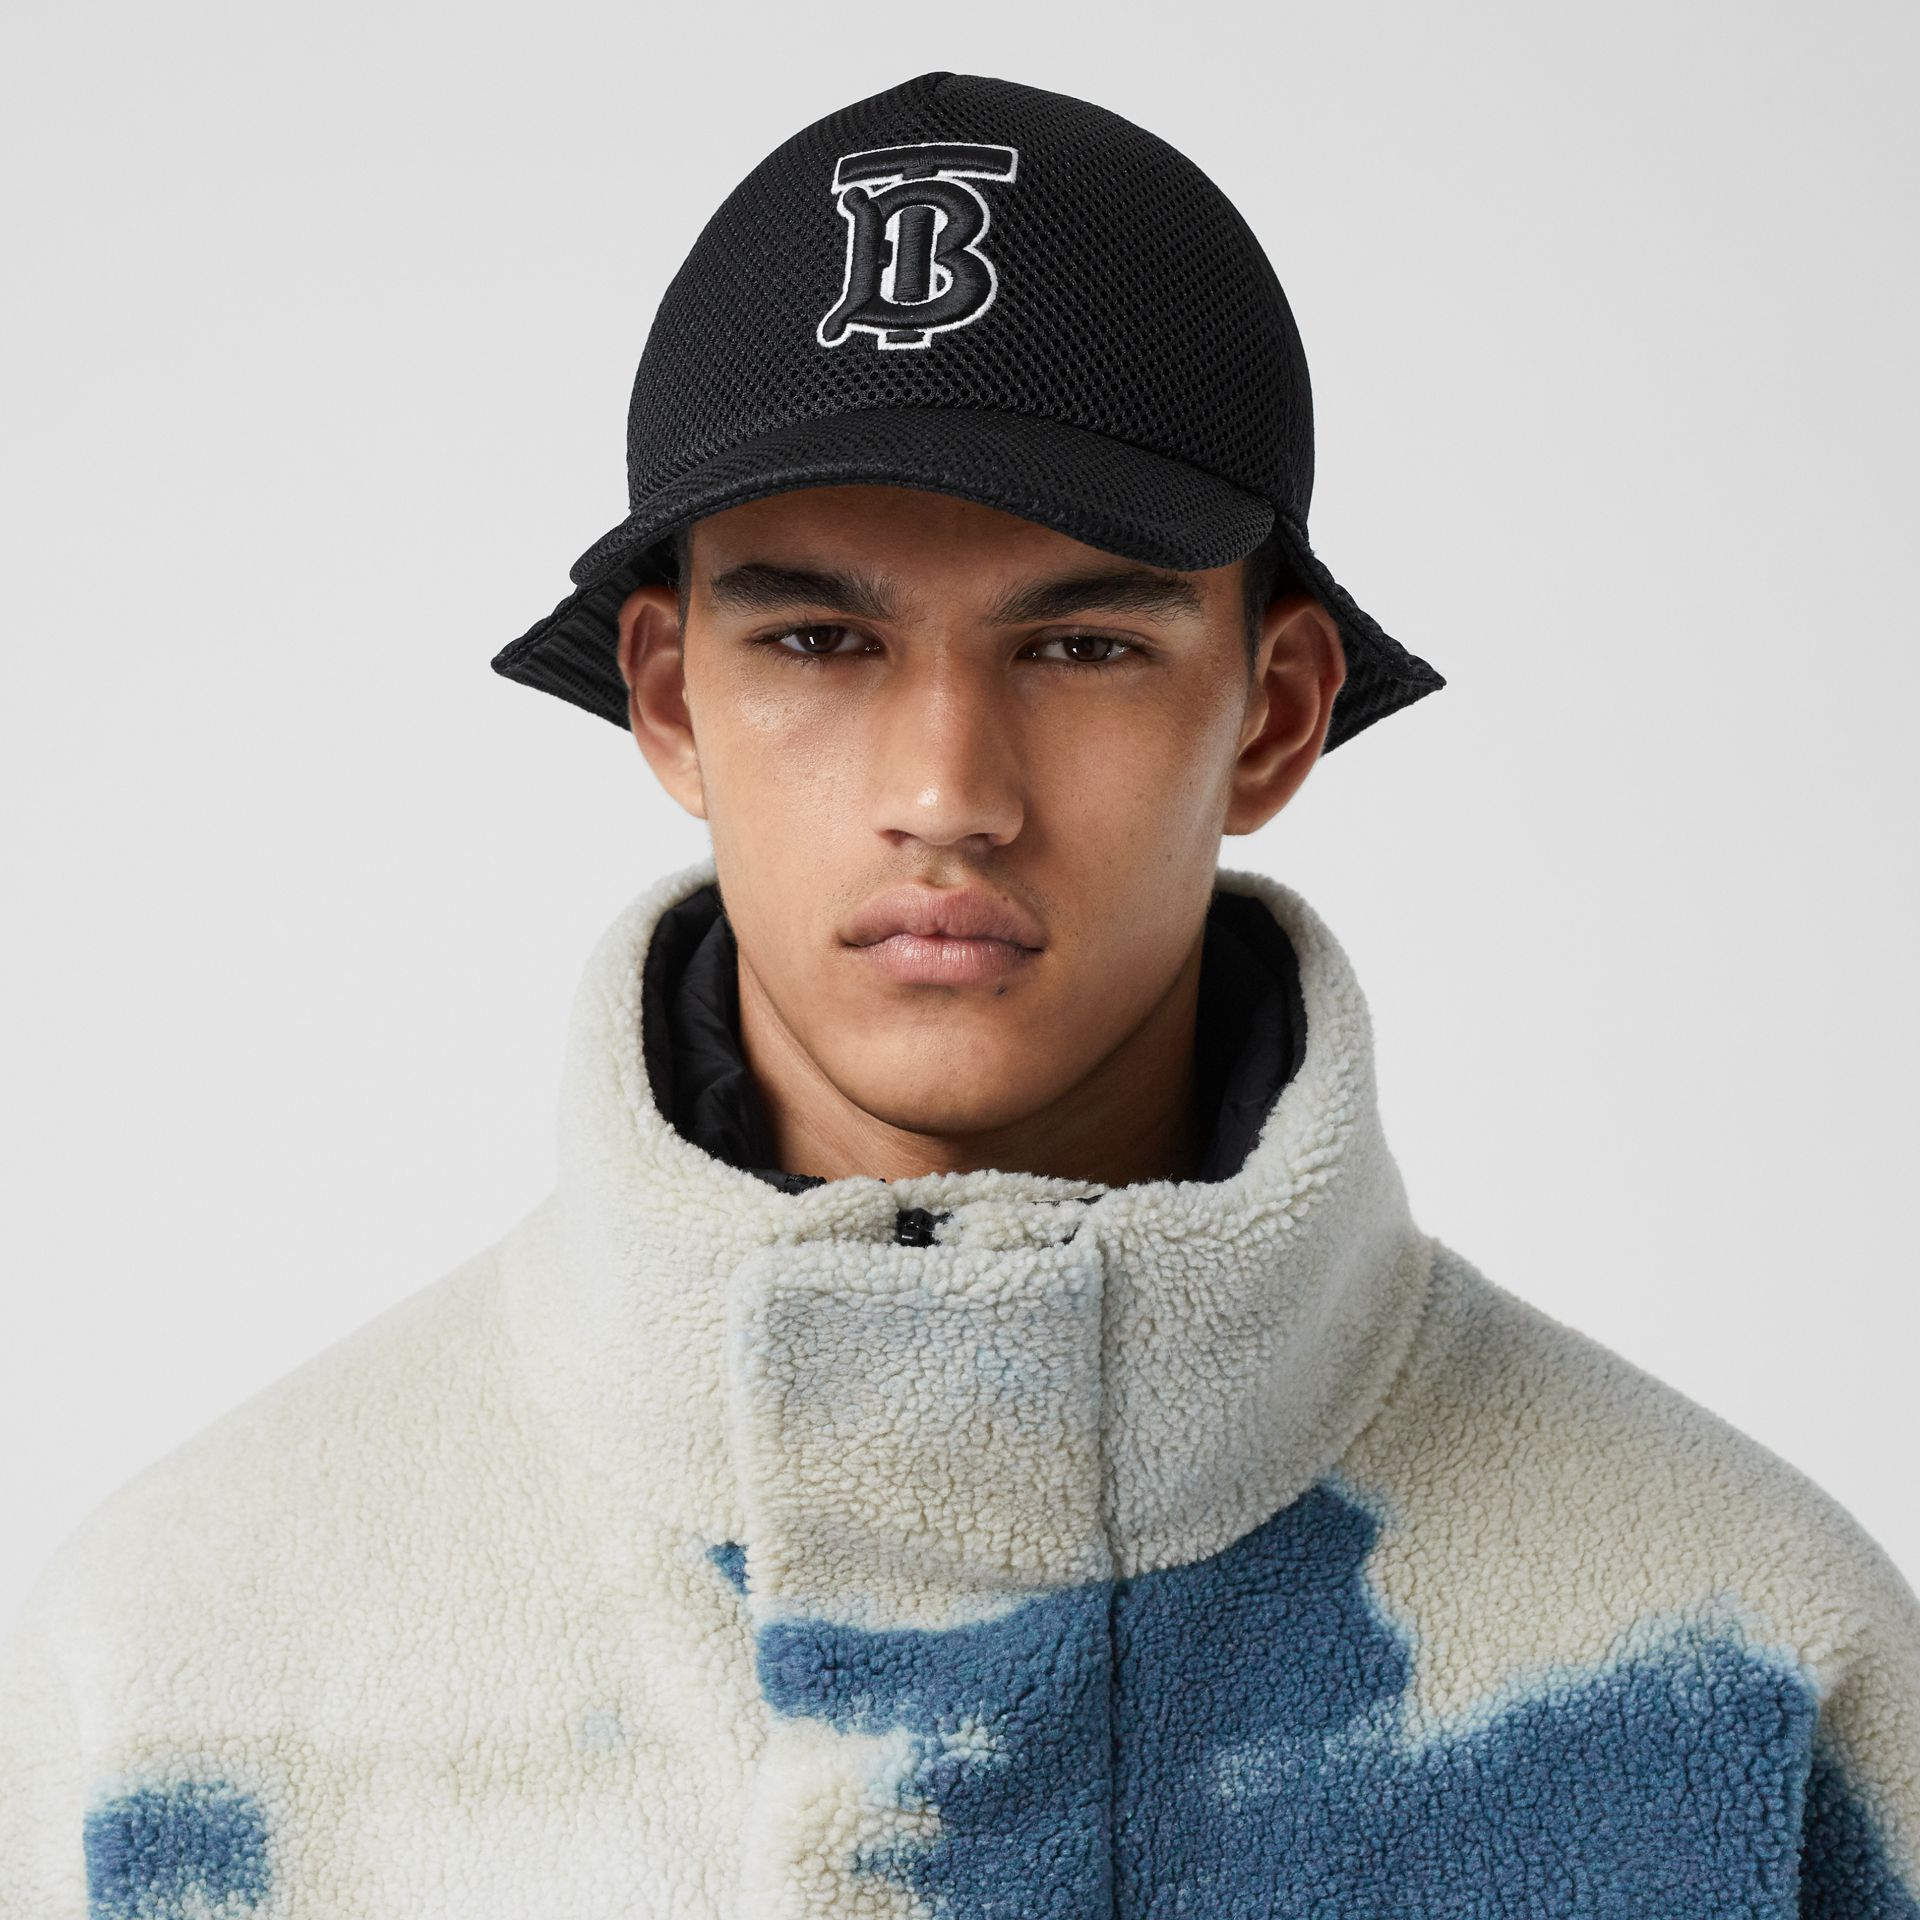 Sea Print Fleece Jacket with Detachable Warmer in Deep Teal - Men | Burberry - gallery image 4